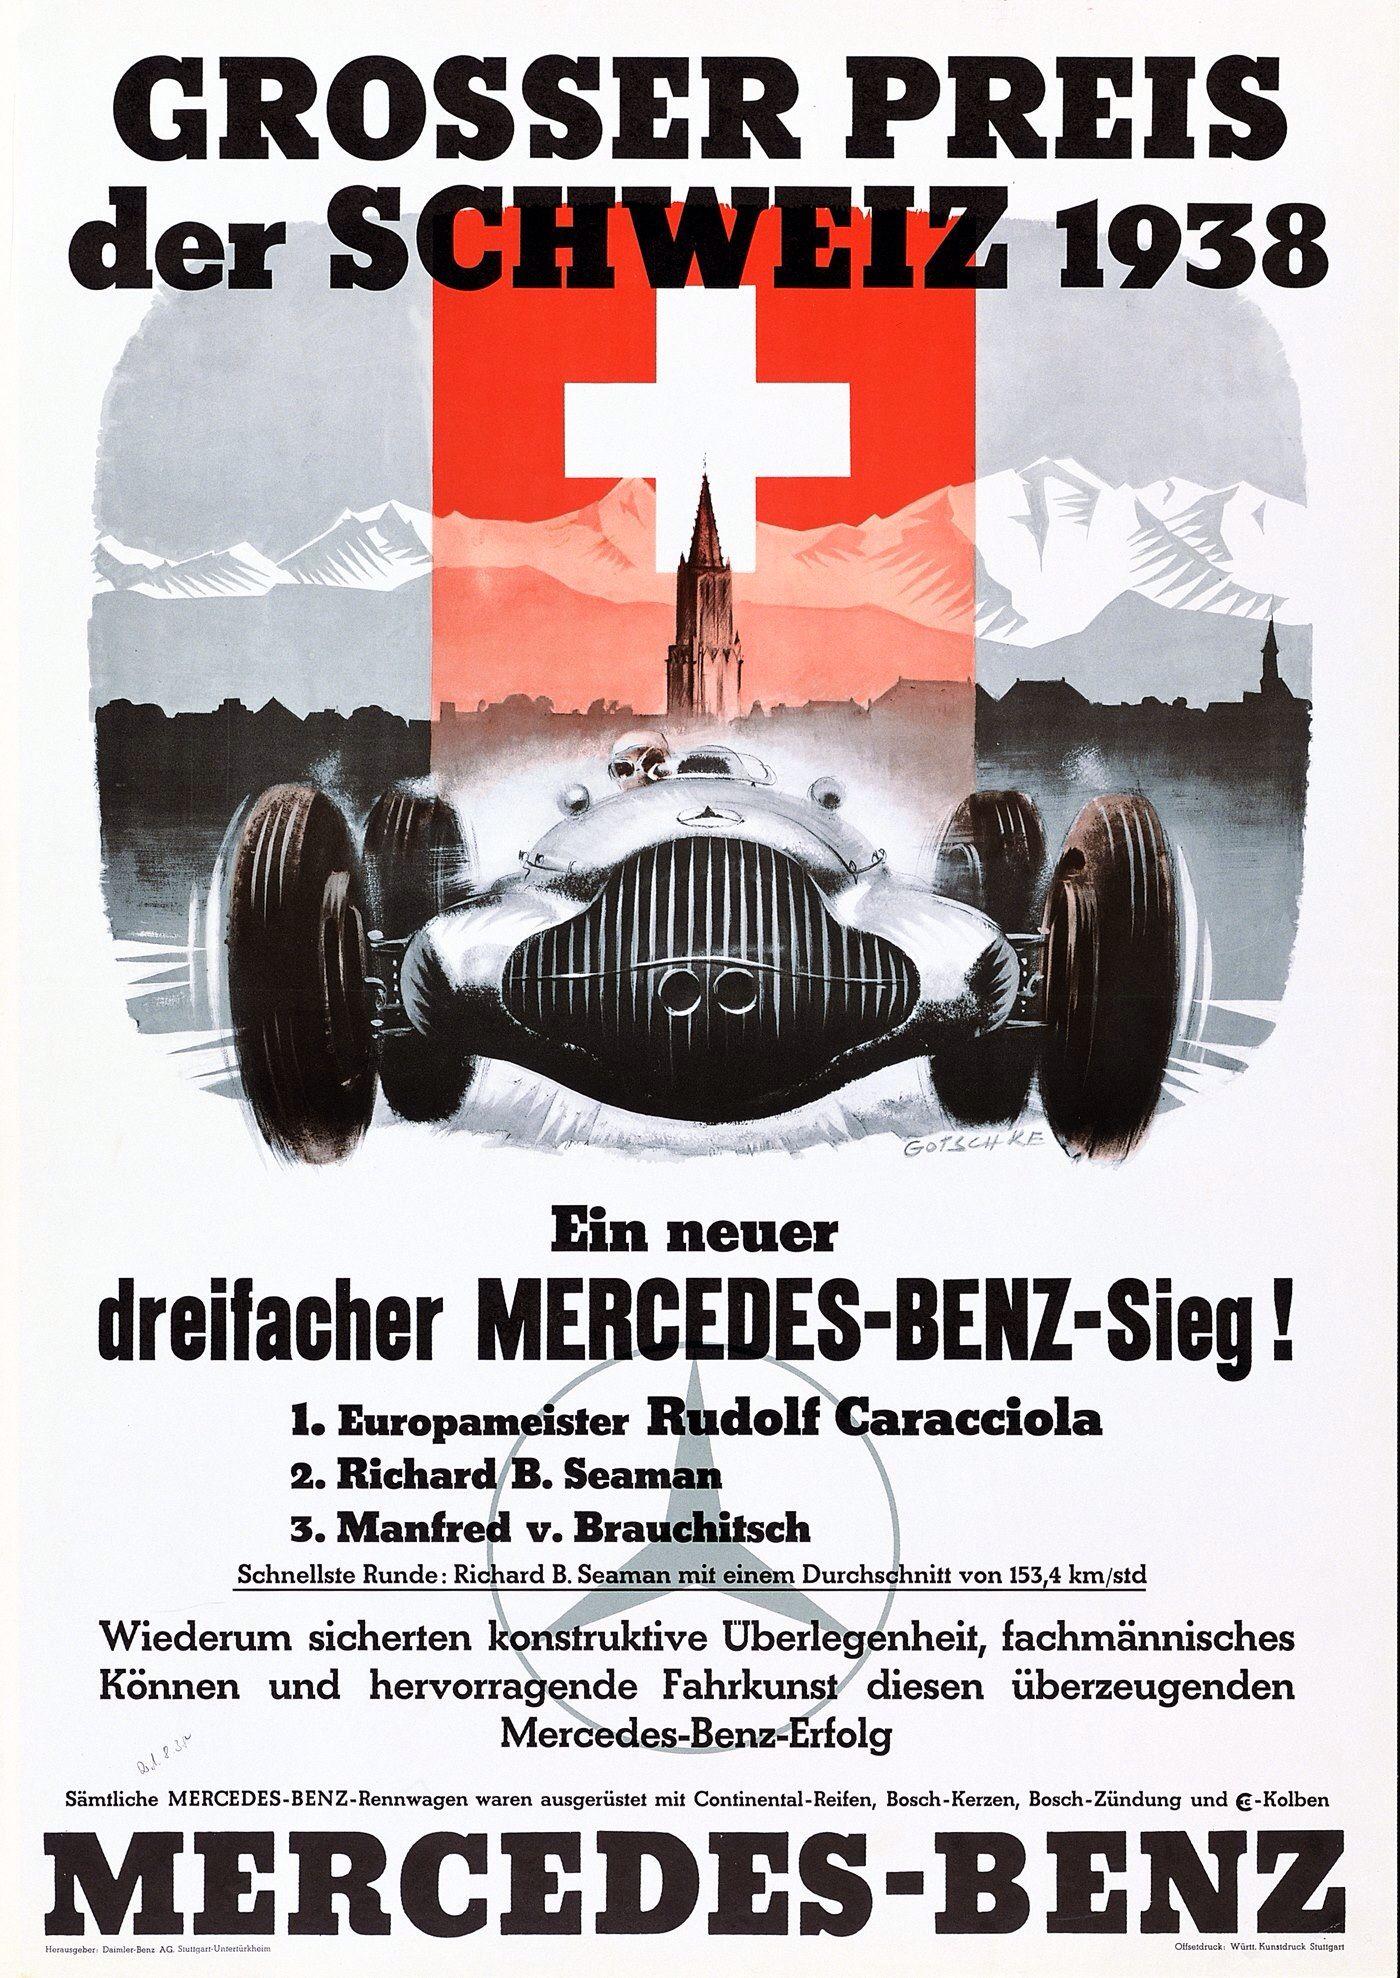 1938 swiss grand prix mercedes benz poster auto posters pinterest grand prix benz and. Black Bedroom Furniture Sets. Home Design Ideas